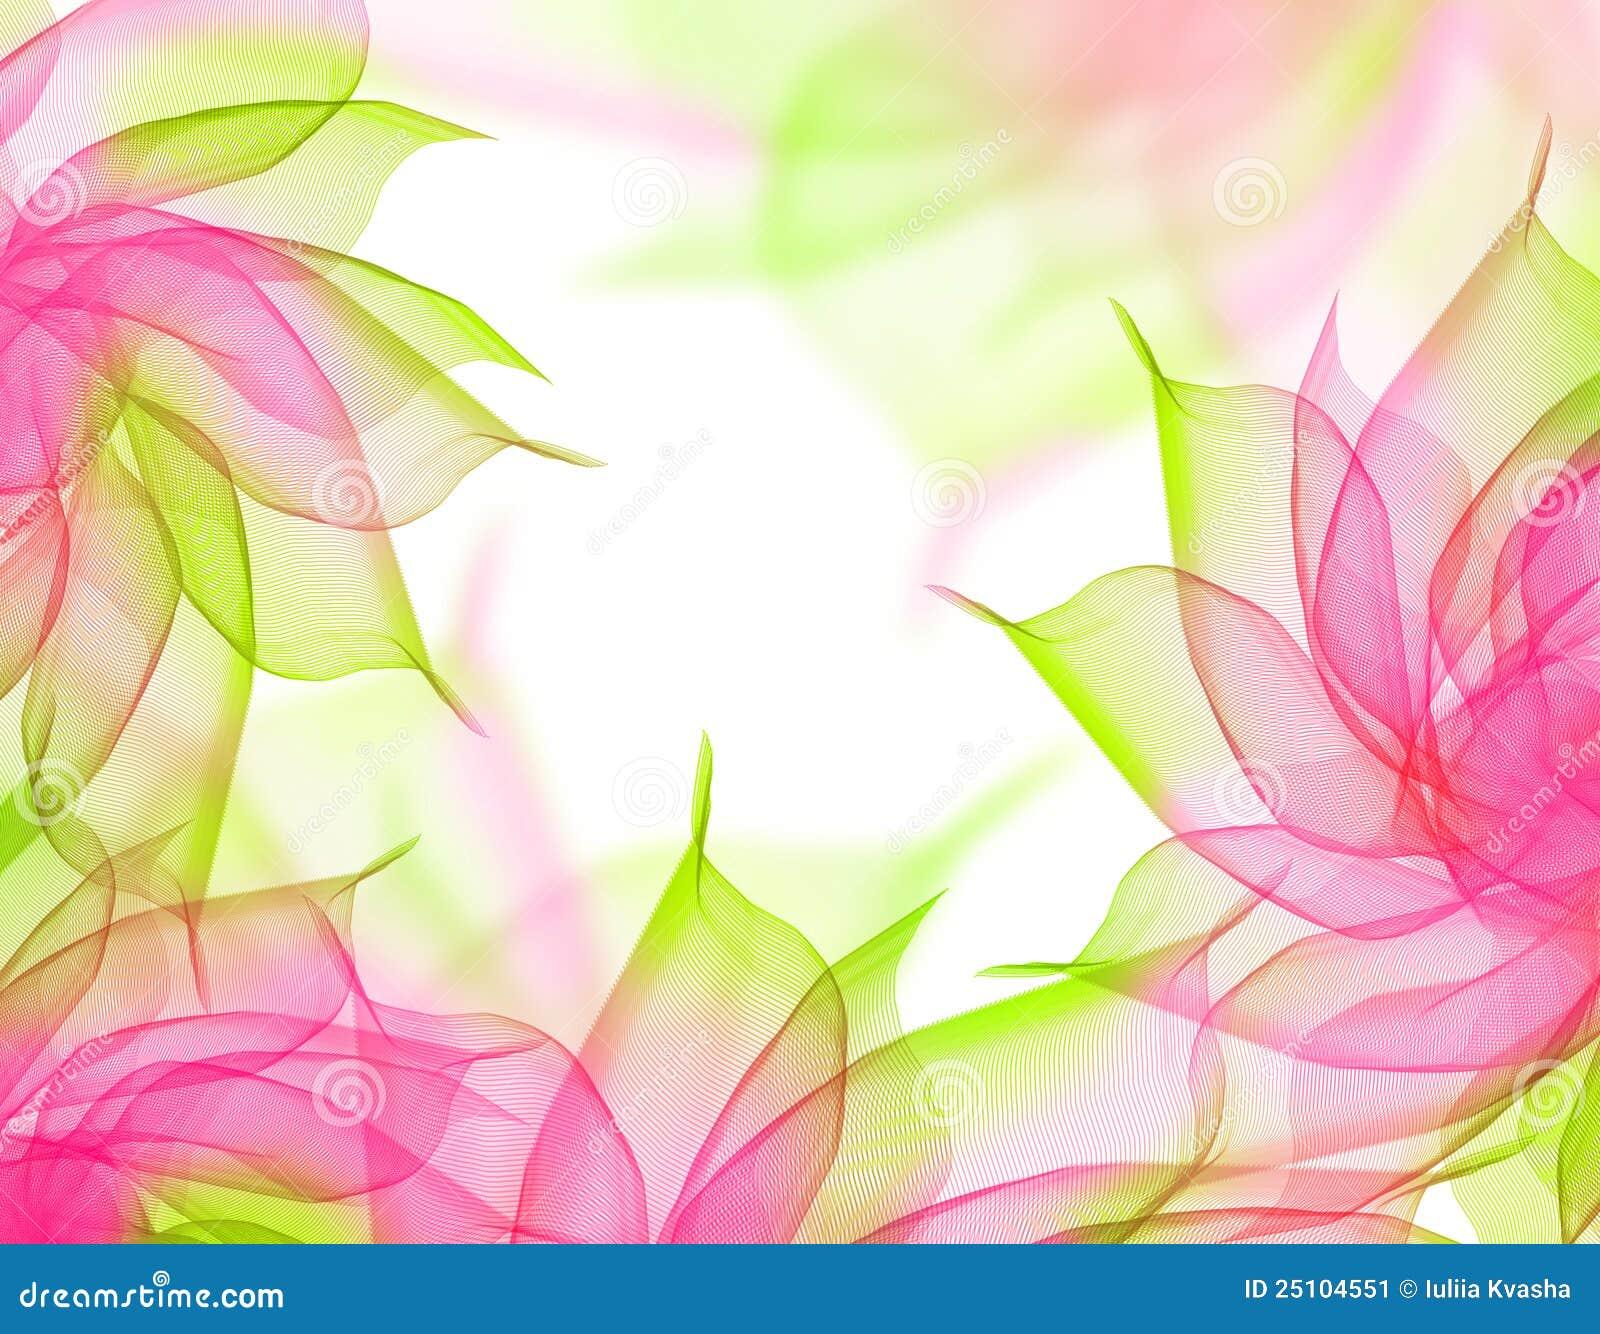 Transparent Floral Background Stock Image Image Of Color Fresh